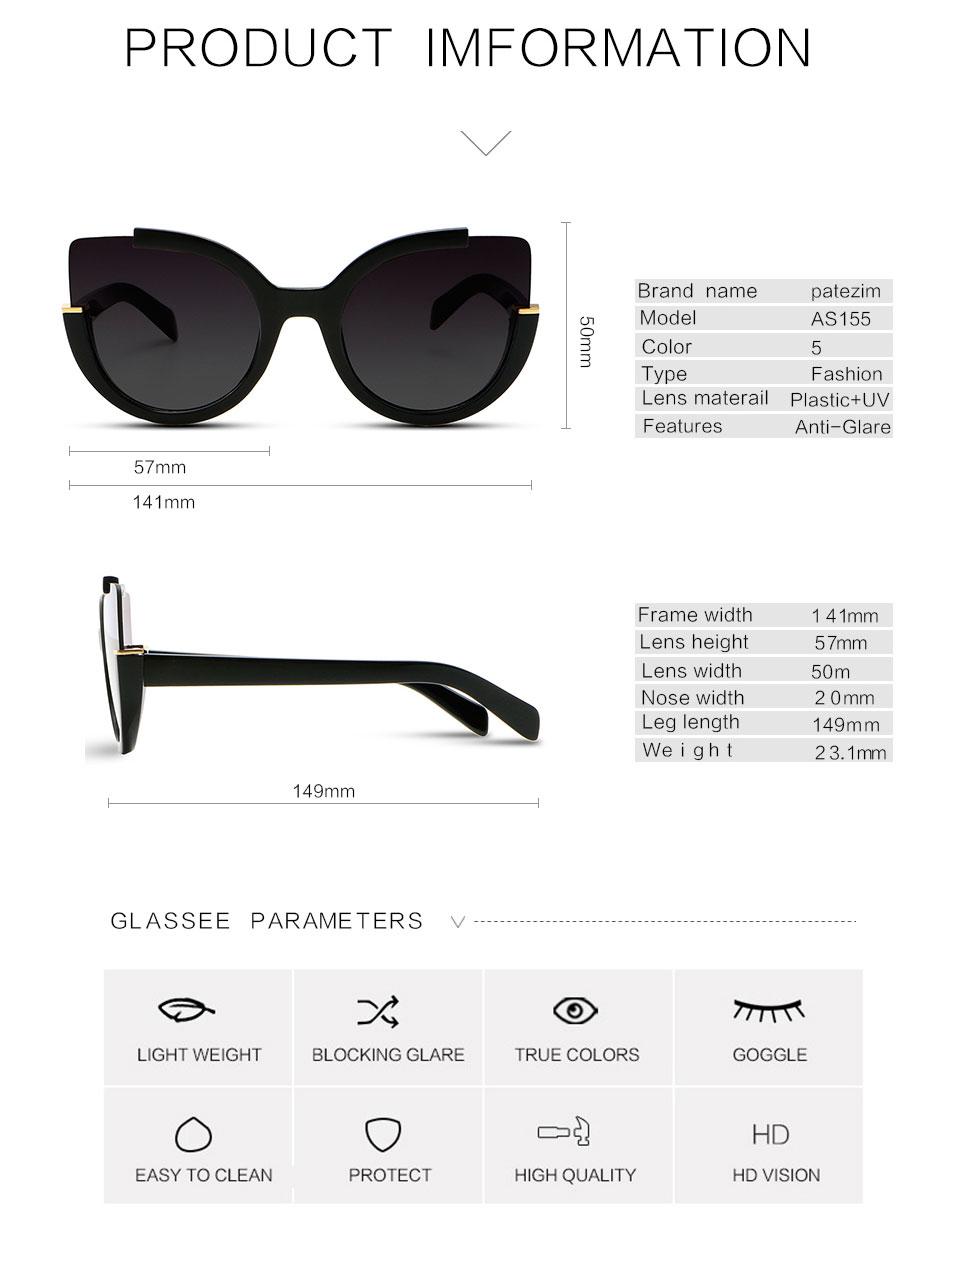 HTB1dwT8PFXXXXbrXpXXq6xXFXXX4 - Cat Eye Sunglasses Women 2017 High Quality Brand Designer Vintage Fashion Driving Sun Glasses For Women UV400 lens gafas de sol